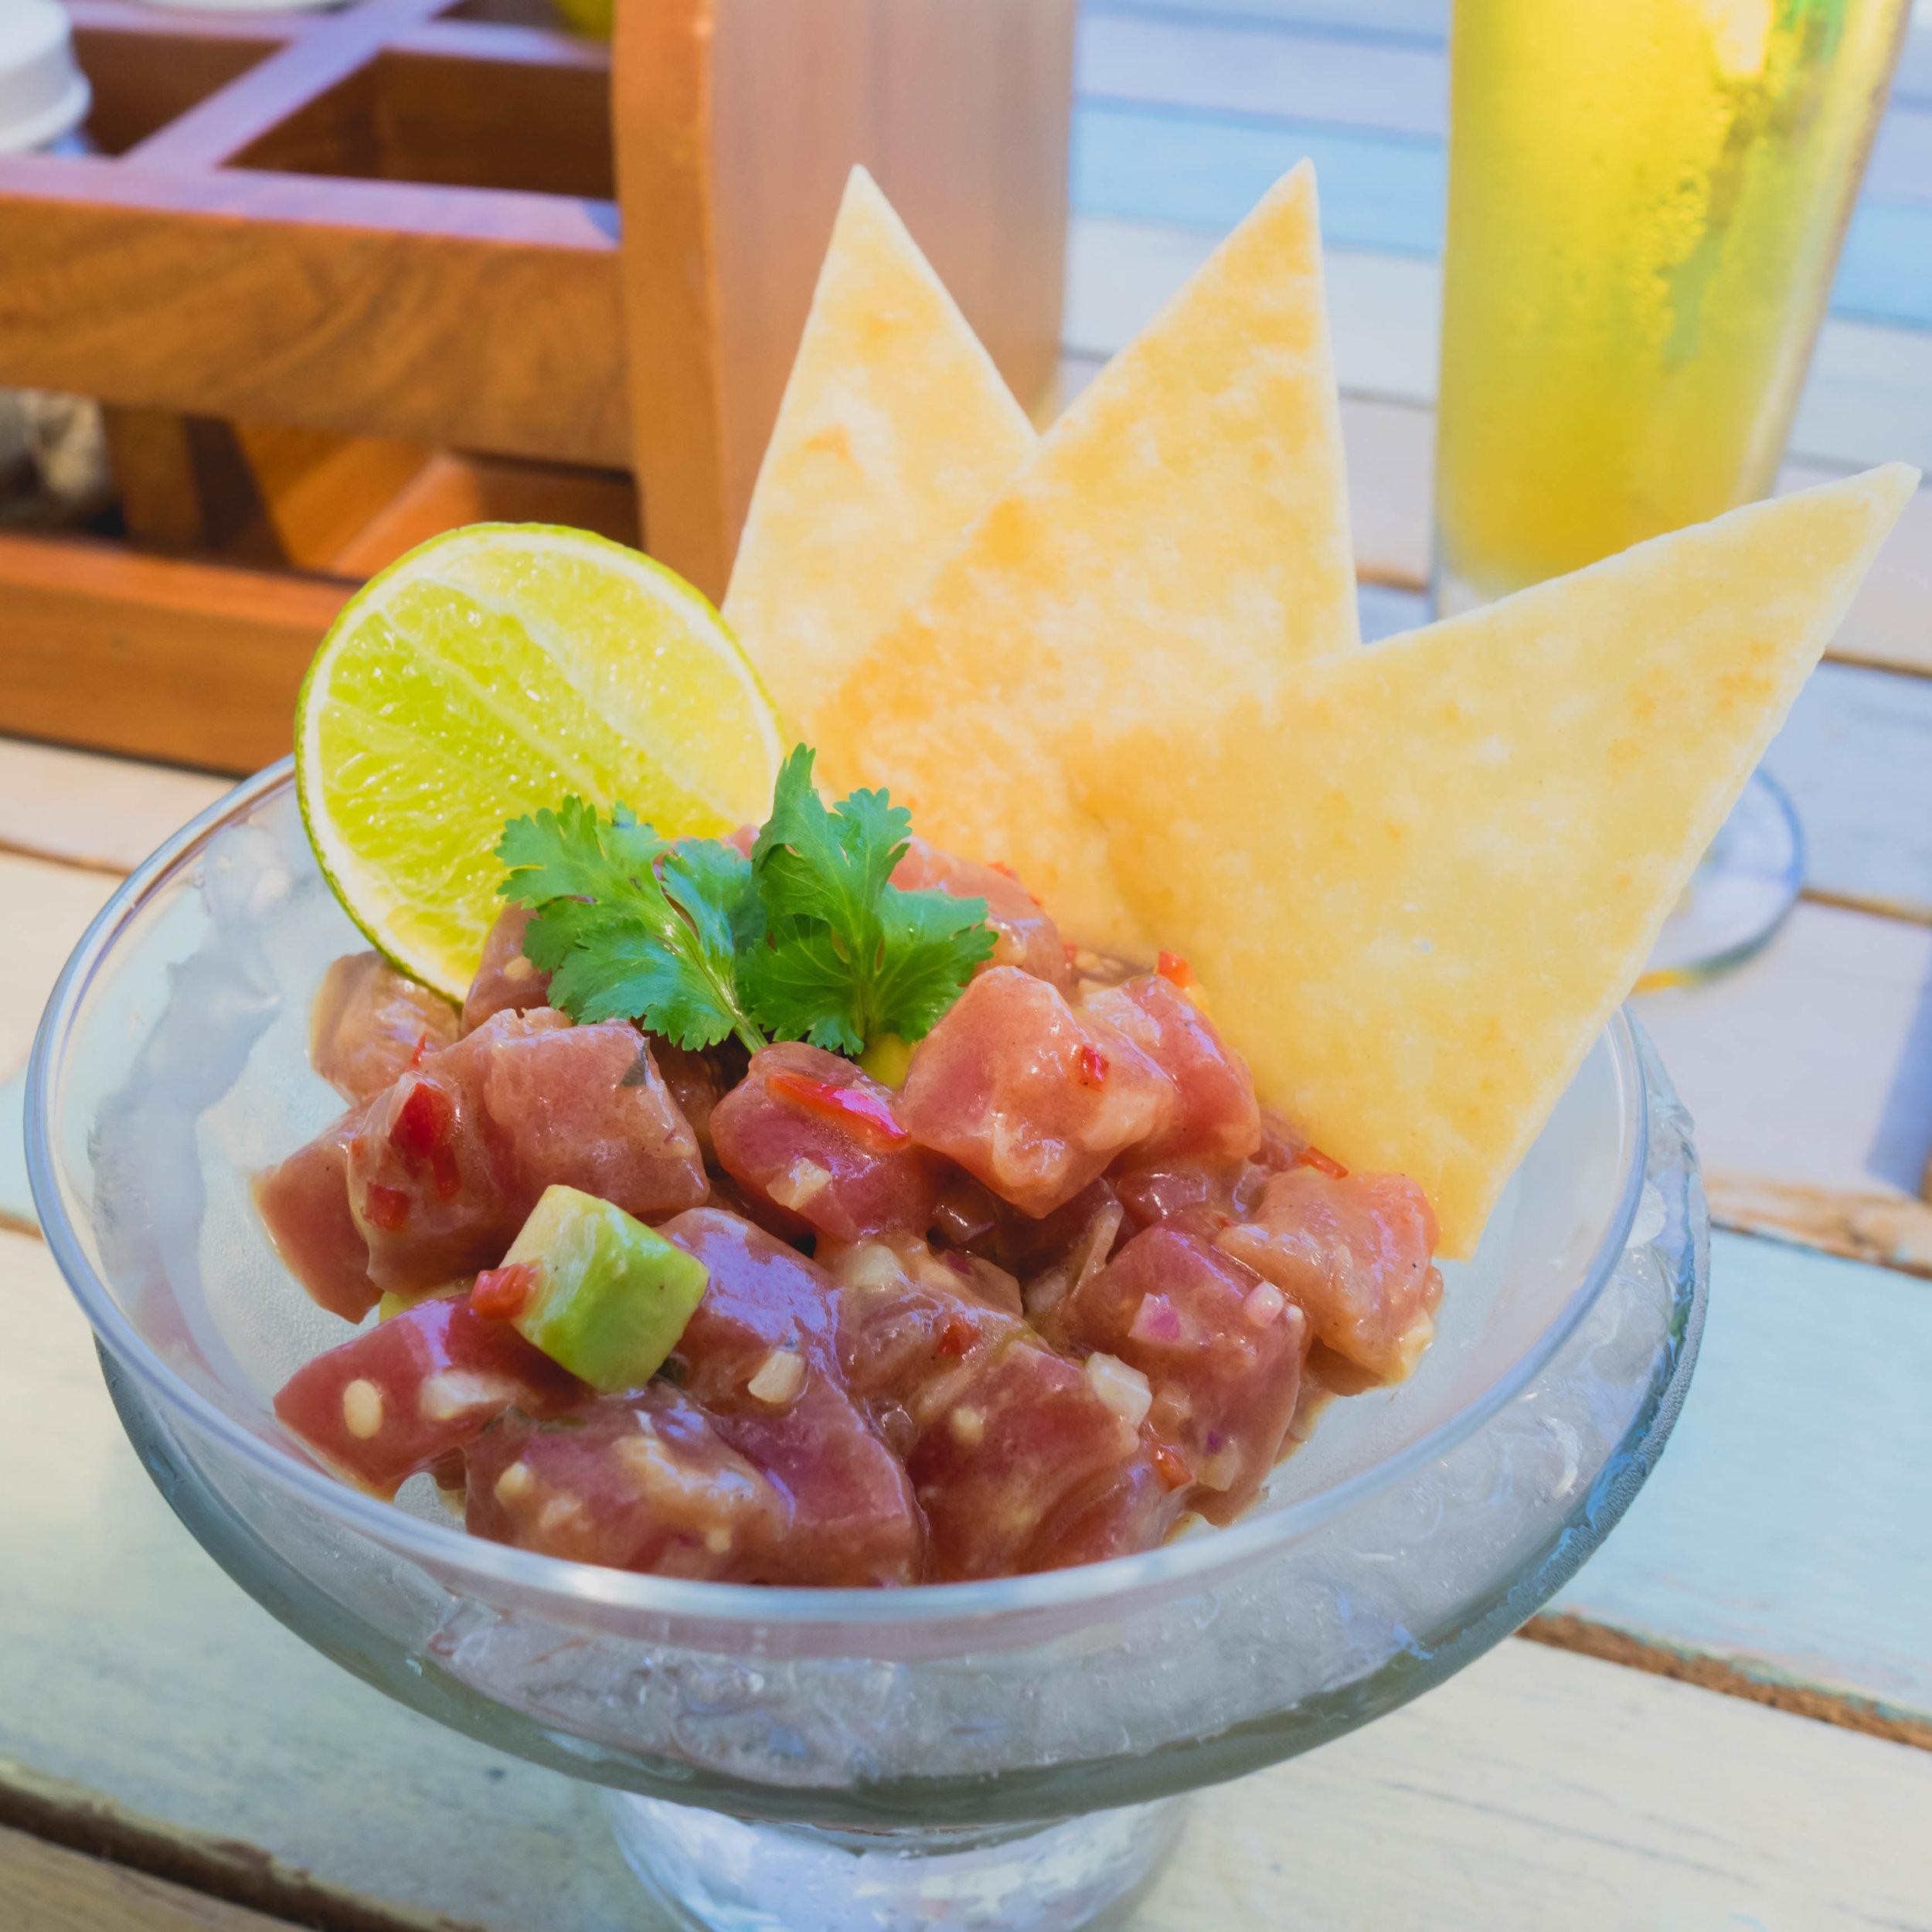 tuna tartare  at lagoon bar with chilli, black pepper, olive oil, shallots, kaffir lime, avocado, tortilla chips.